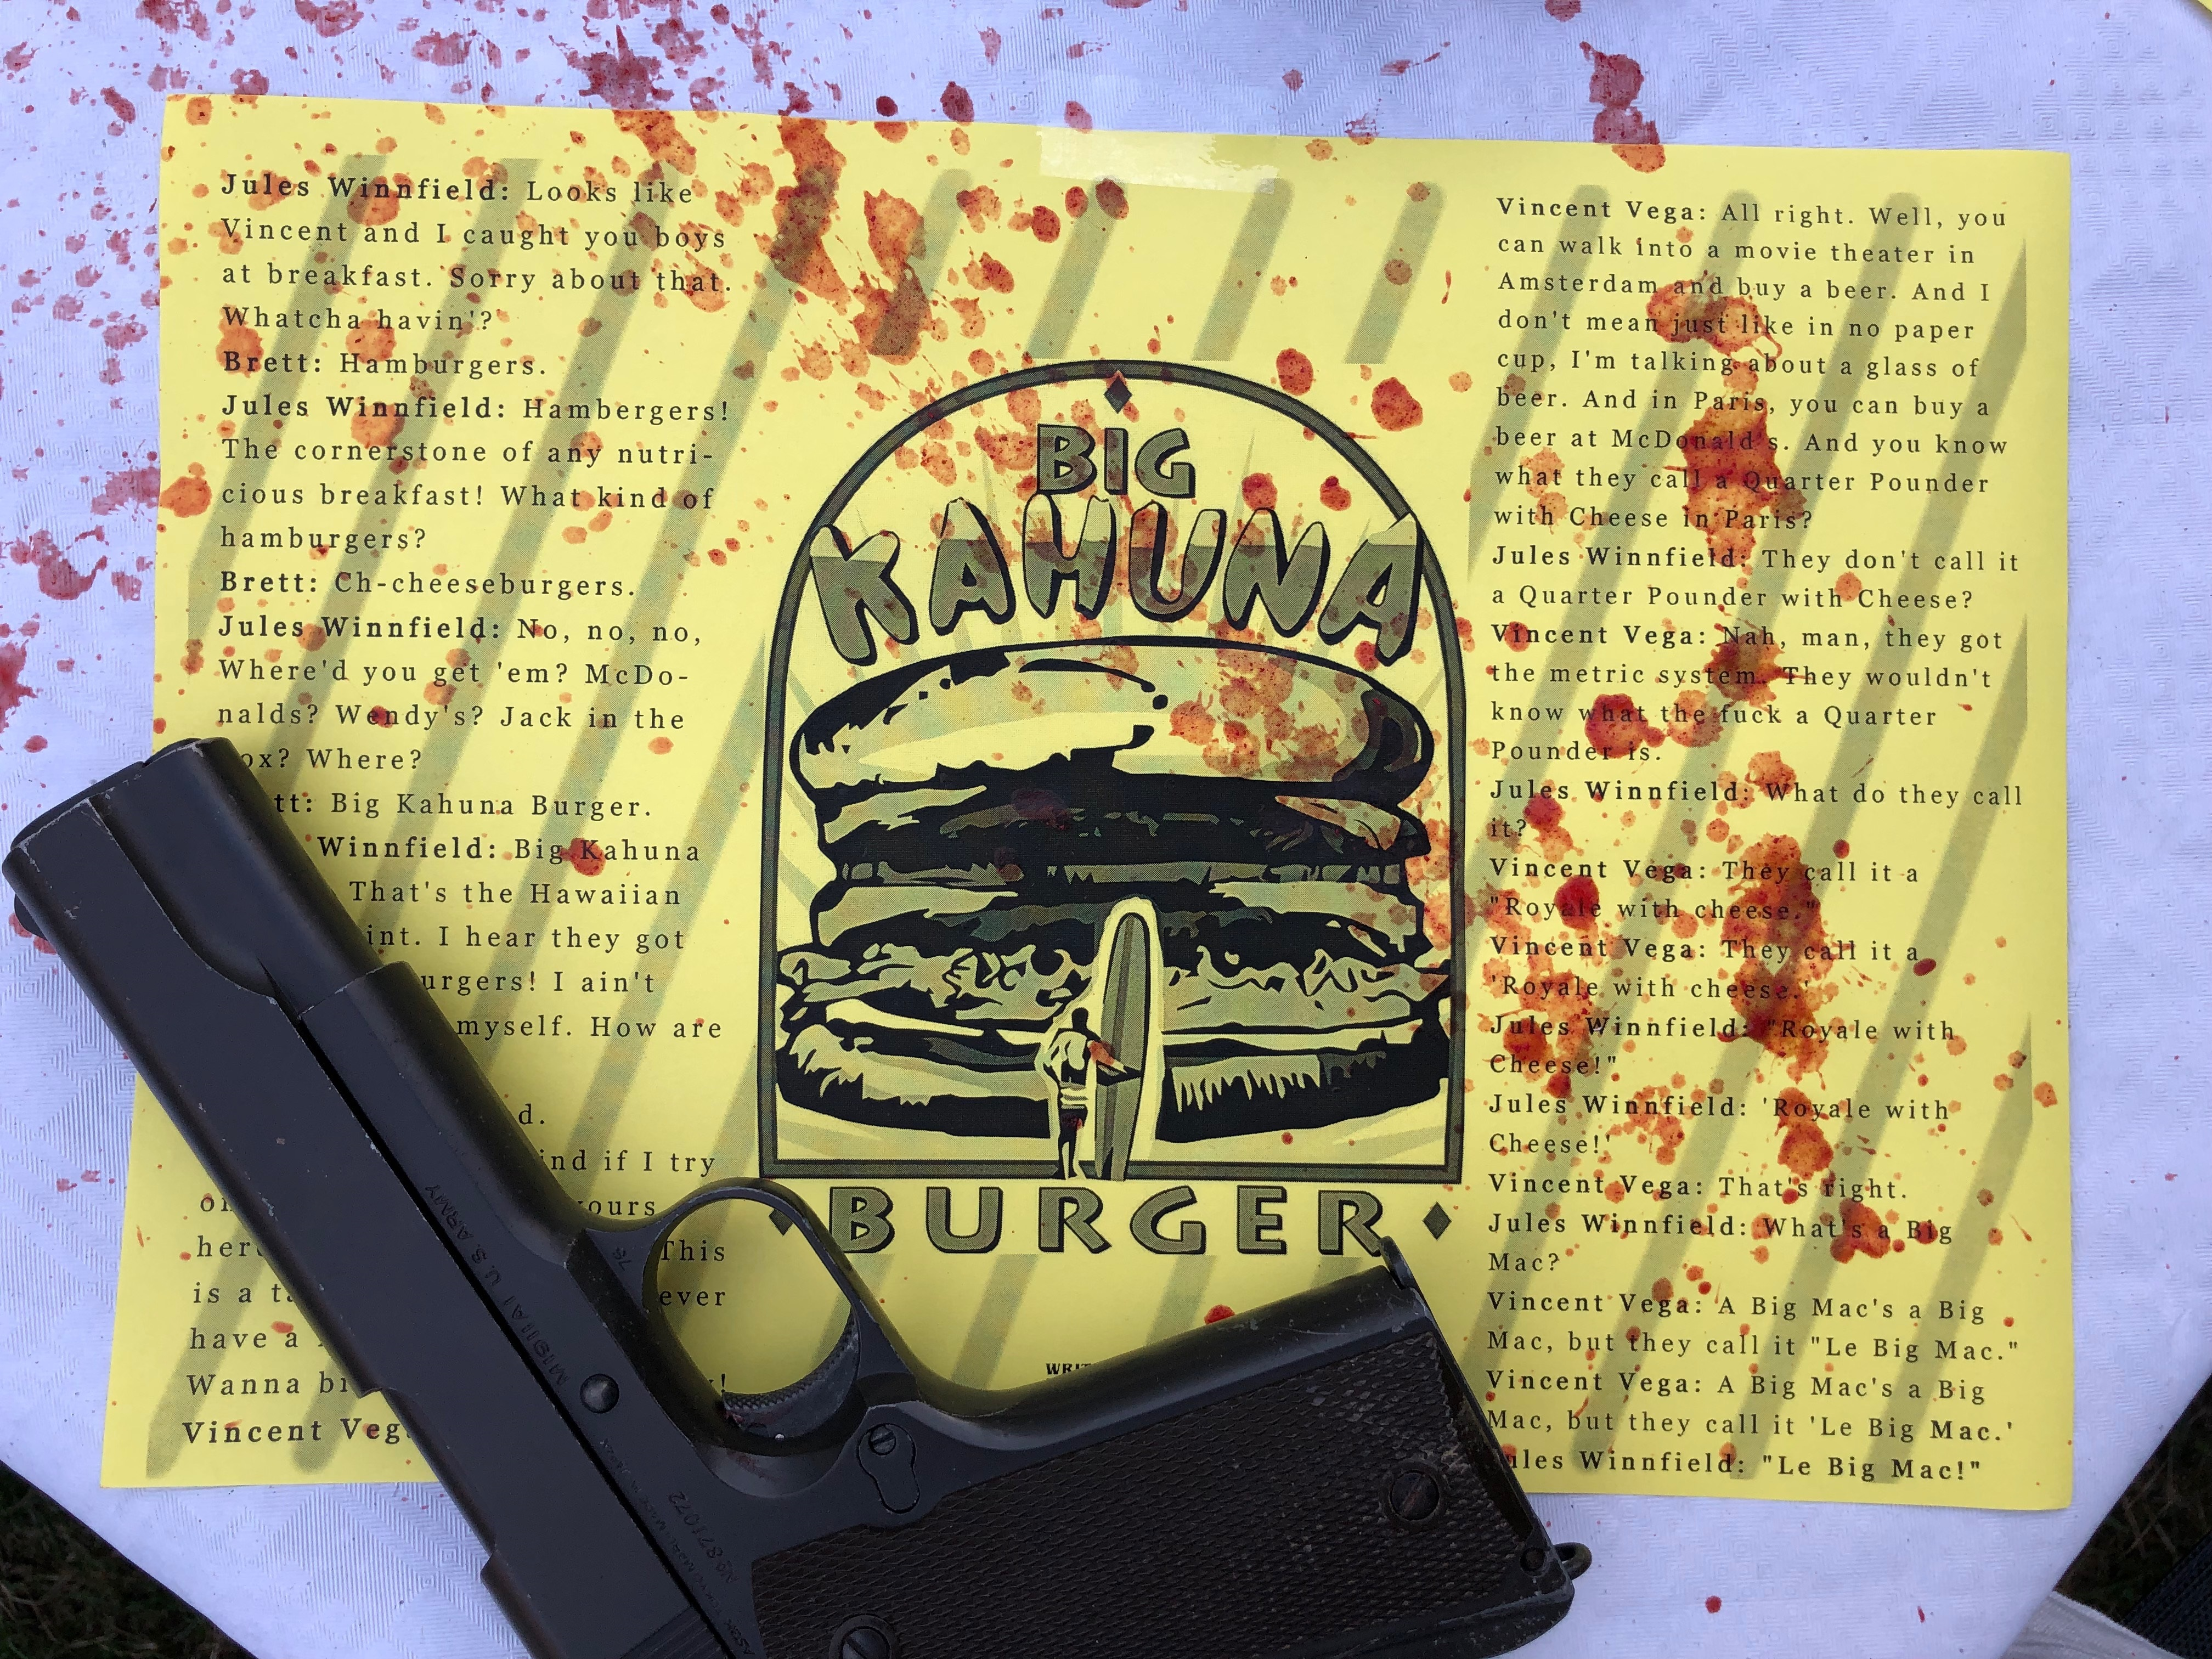 szmk_big_kahuna_burger_diy_recept_recepie_quentin_tarantino_pulp_fiction_csinald_magad_ponyvaregeny_jules_vincent_mia_wallace_zed_tasty_burger_royal_with_cheese_4.JPG